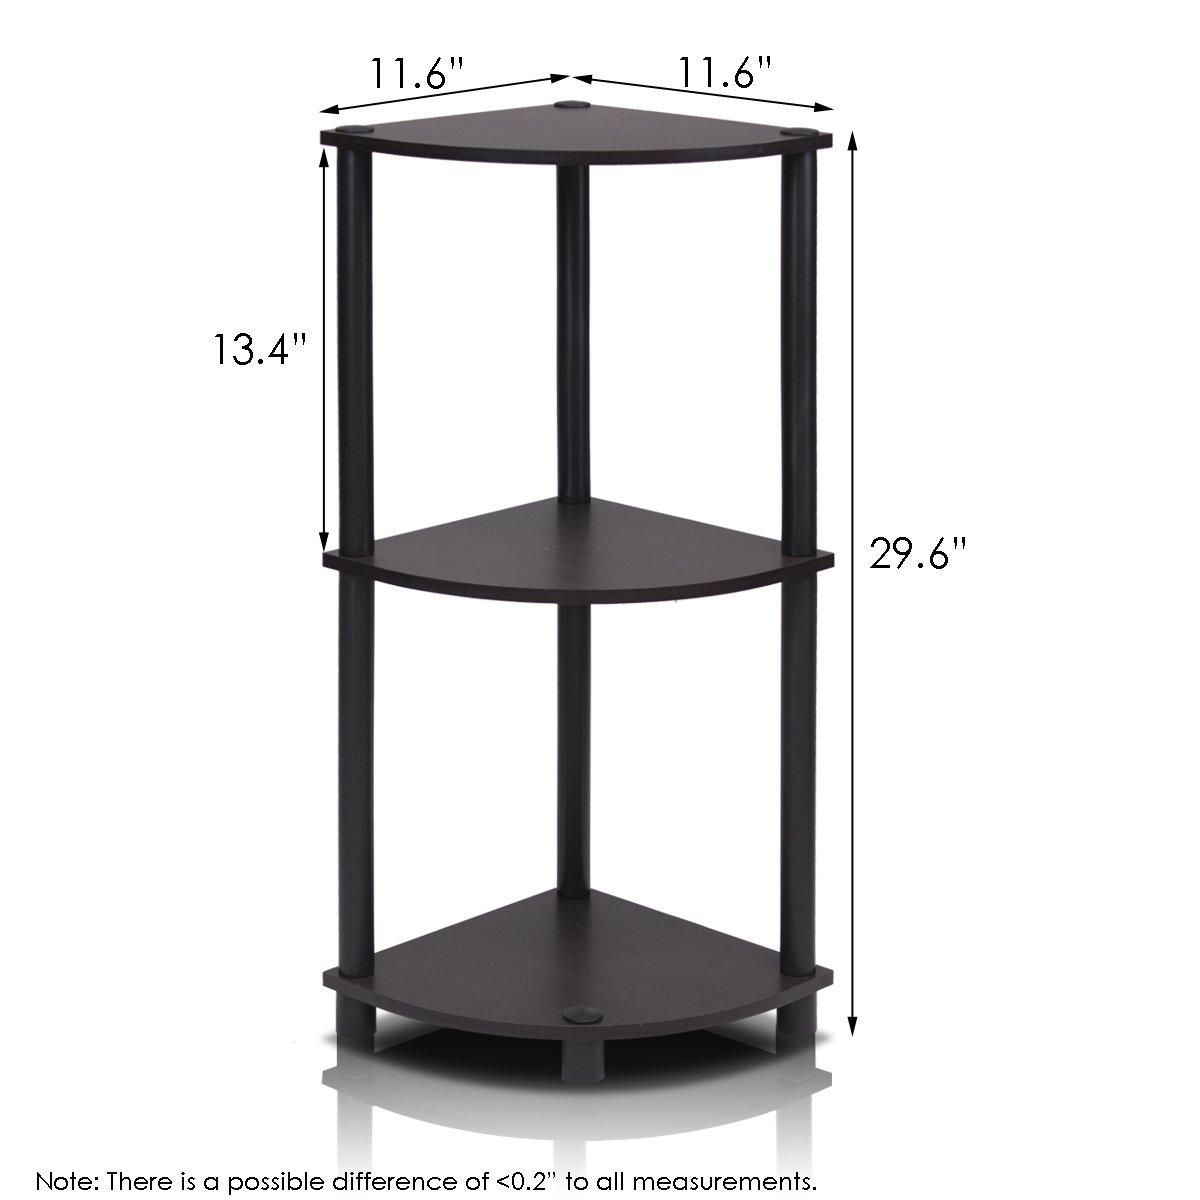 Furinno 12077EX/BK Turn-n-Tube Multipurpose 3-Tier Corner Shelf, Espresso/Black